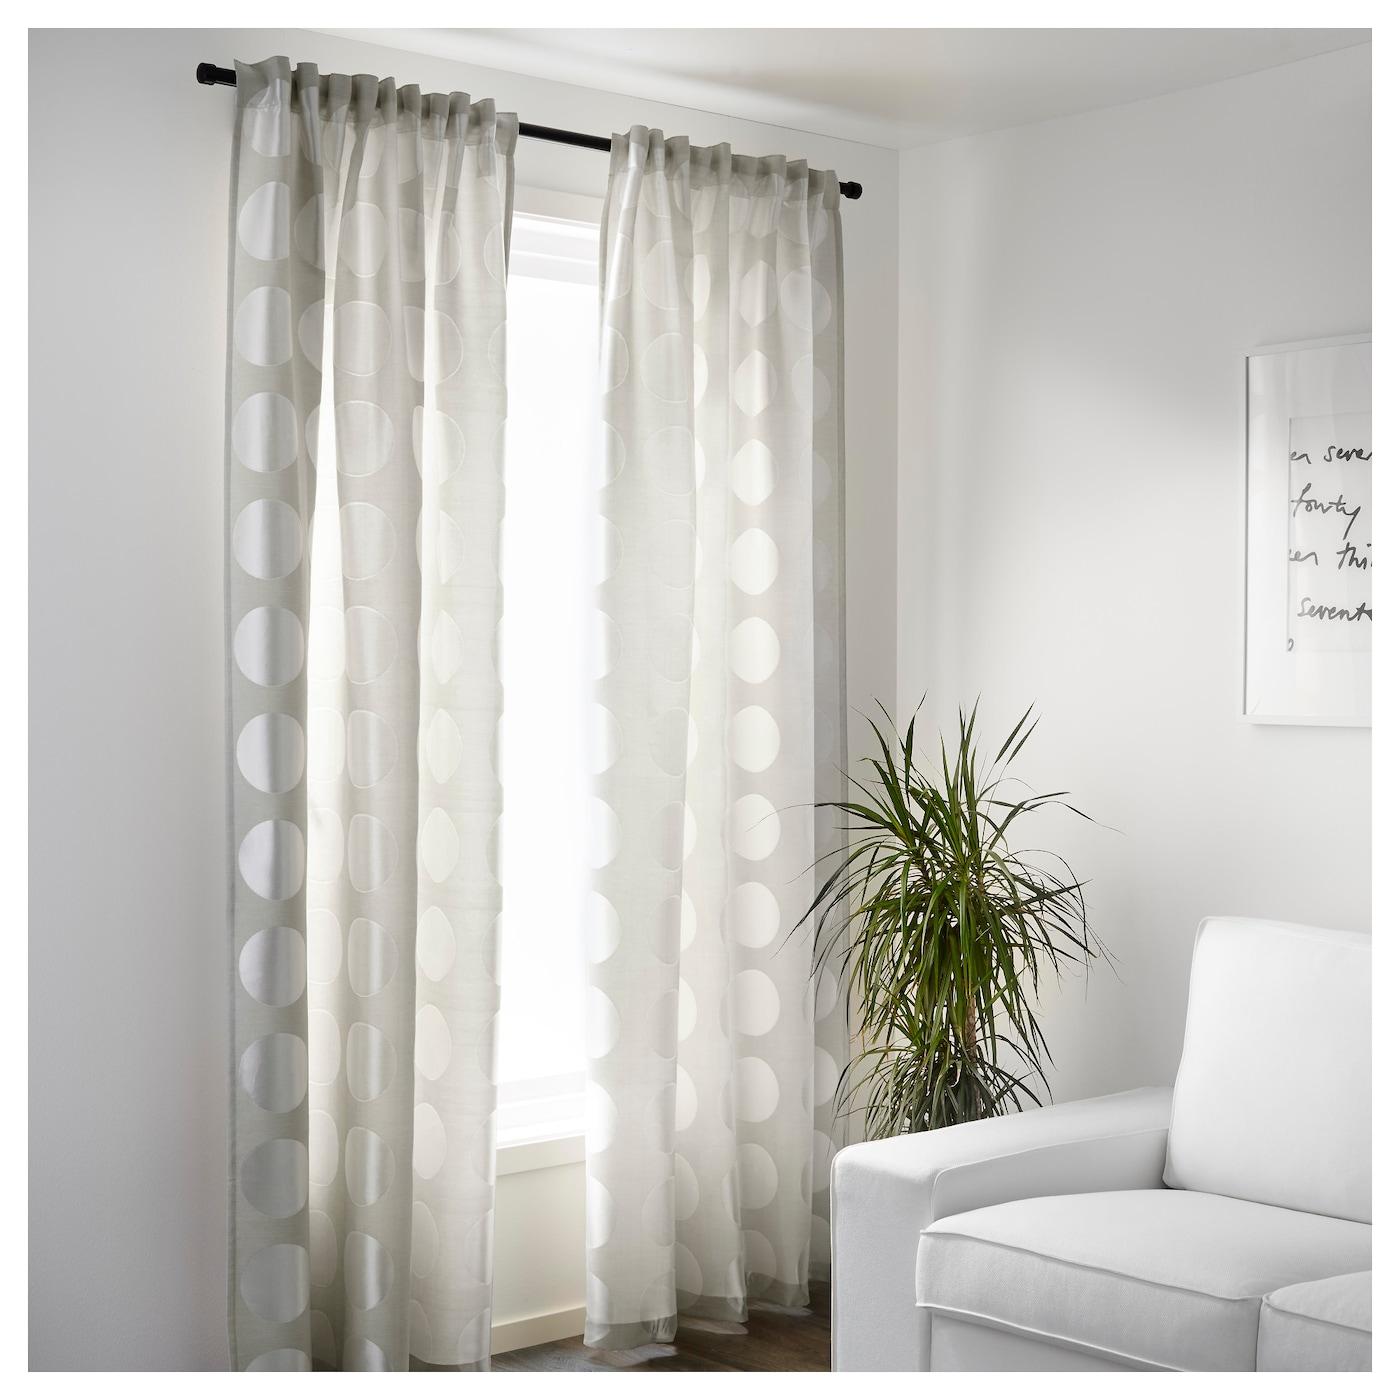 ninni rund rideaux 1 paire beige clair 145x300 cm ikea. Black Bedroom Furniture Sets. Home Design Ideas